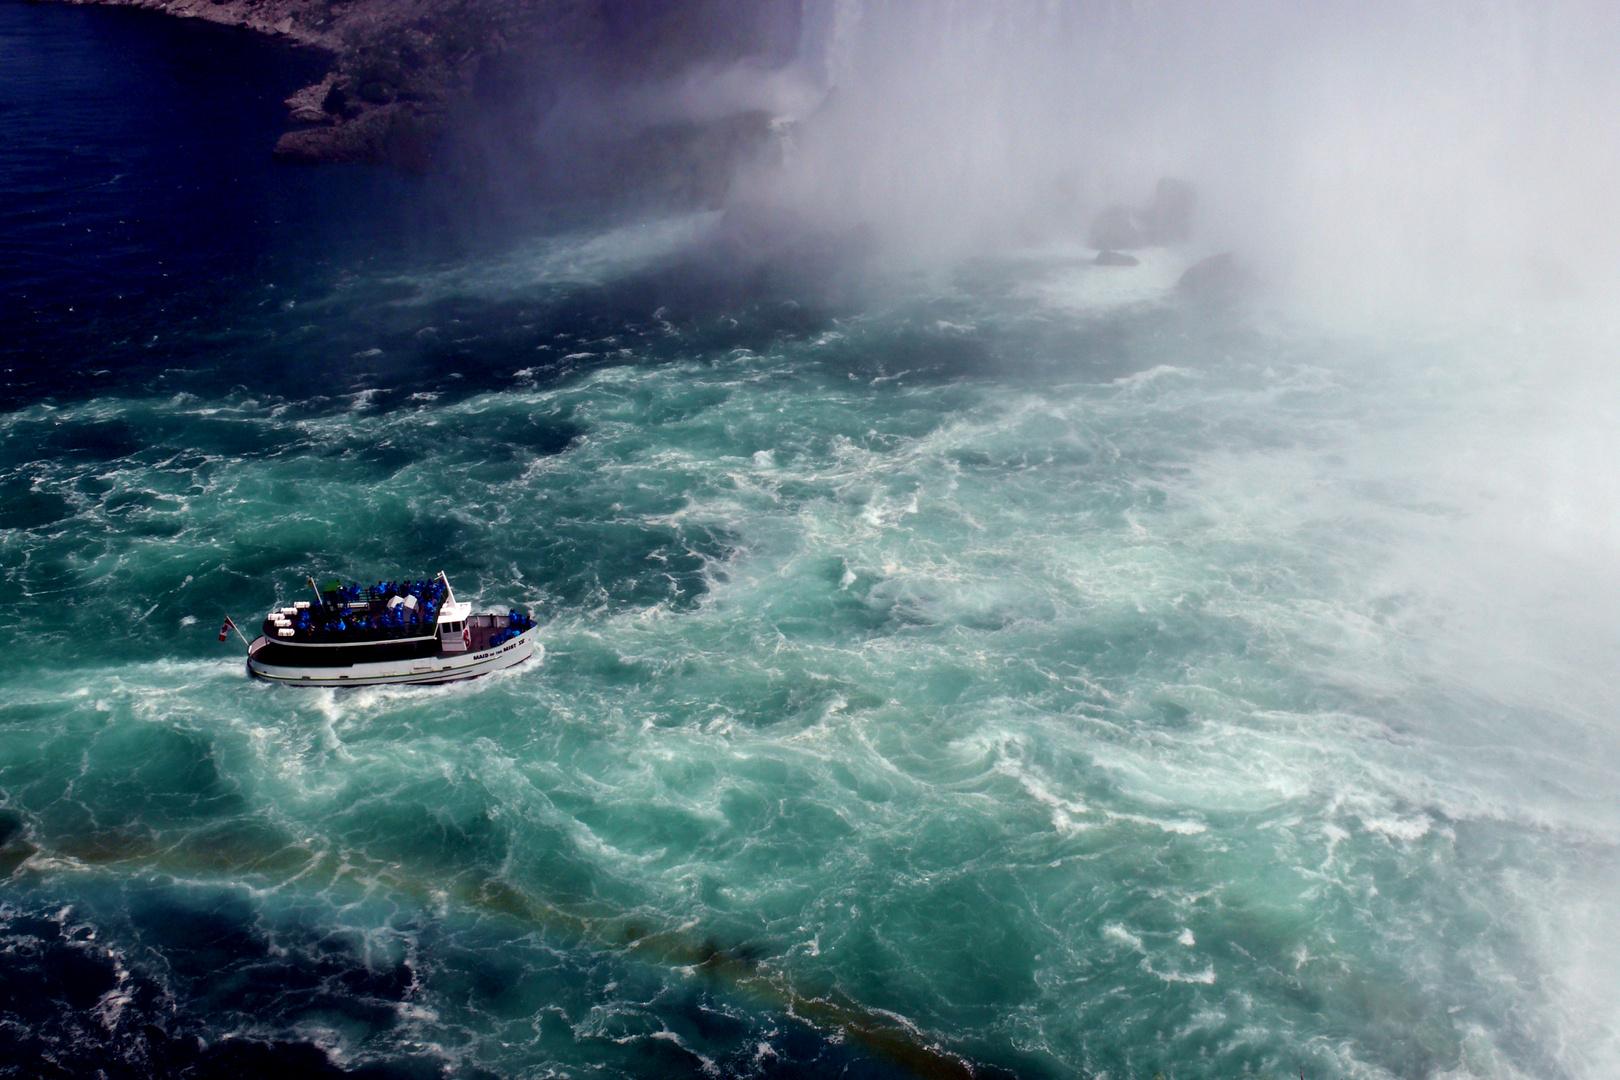 ***Niagara Falls***